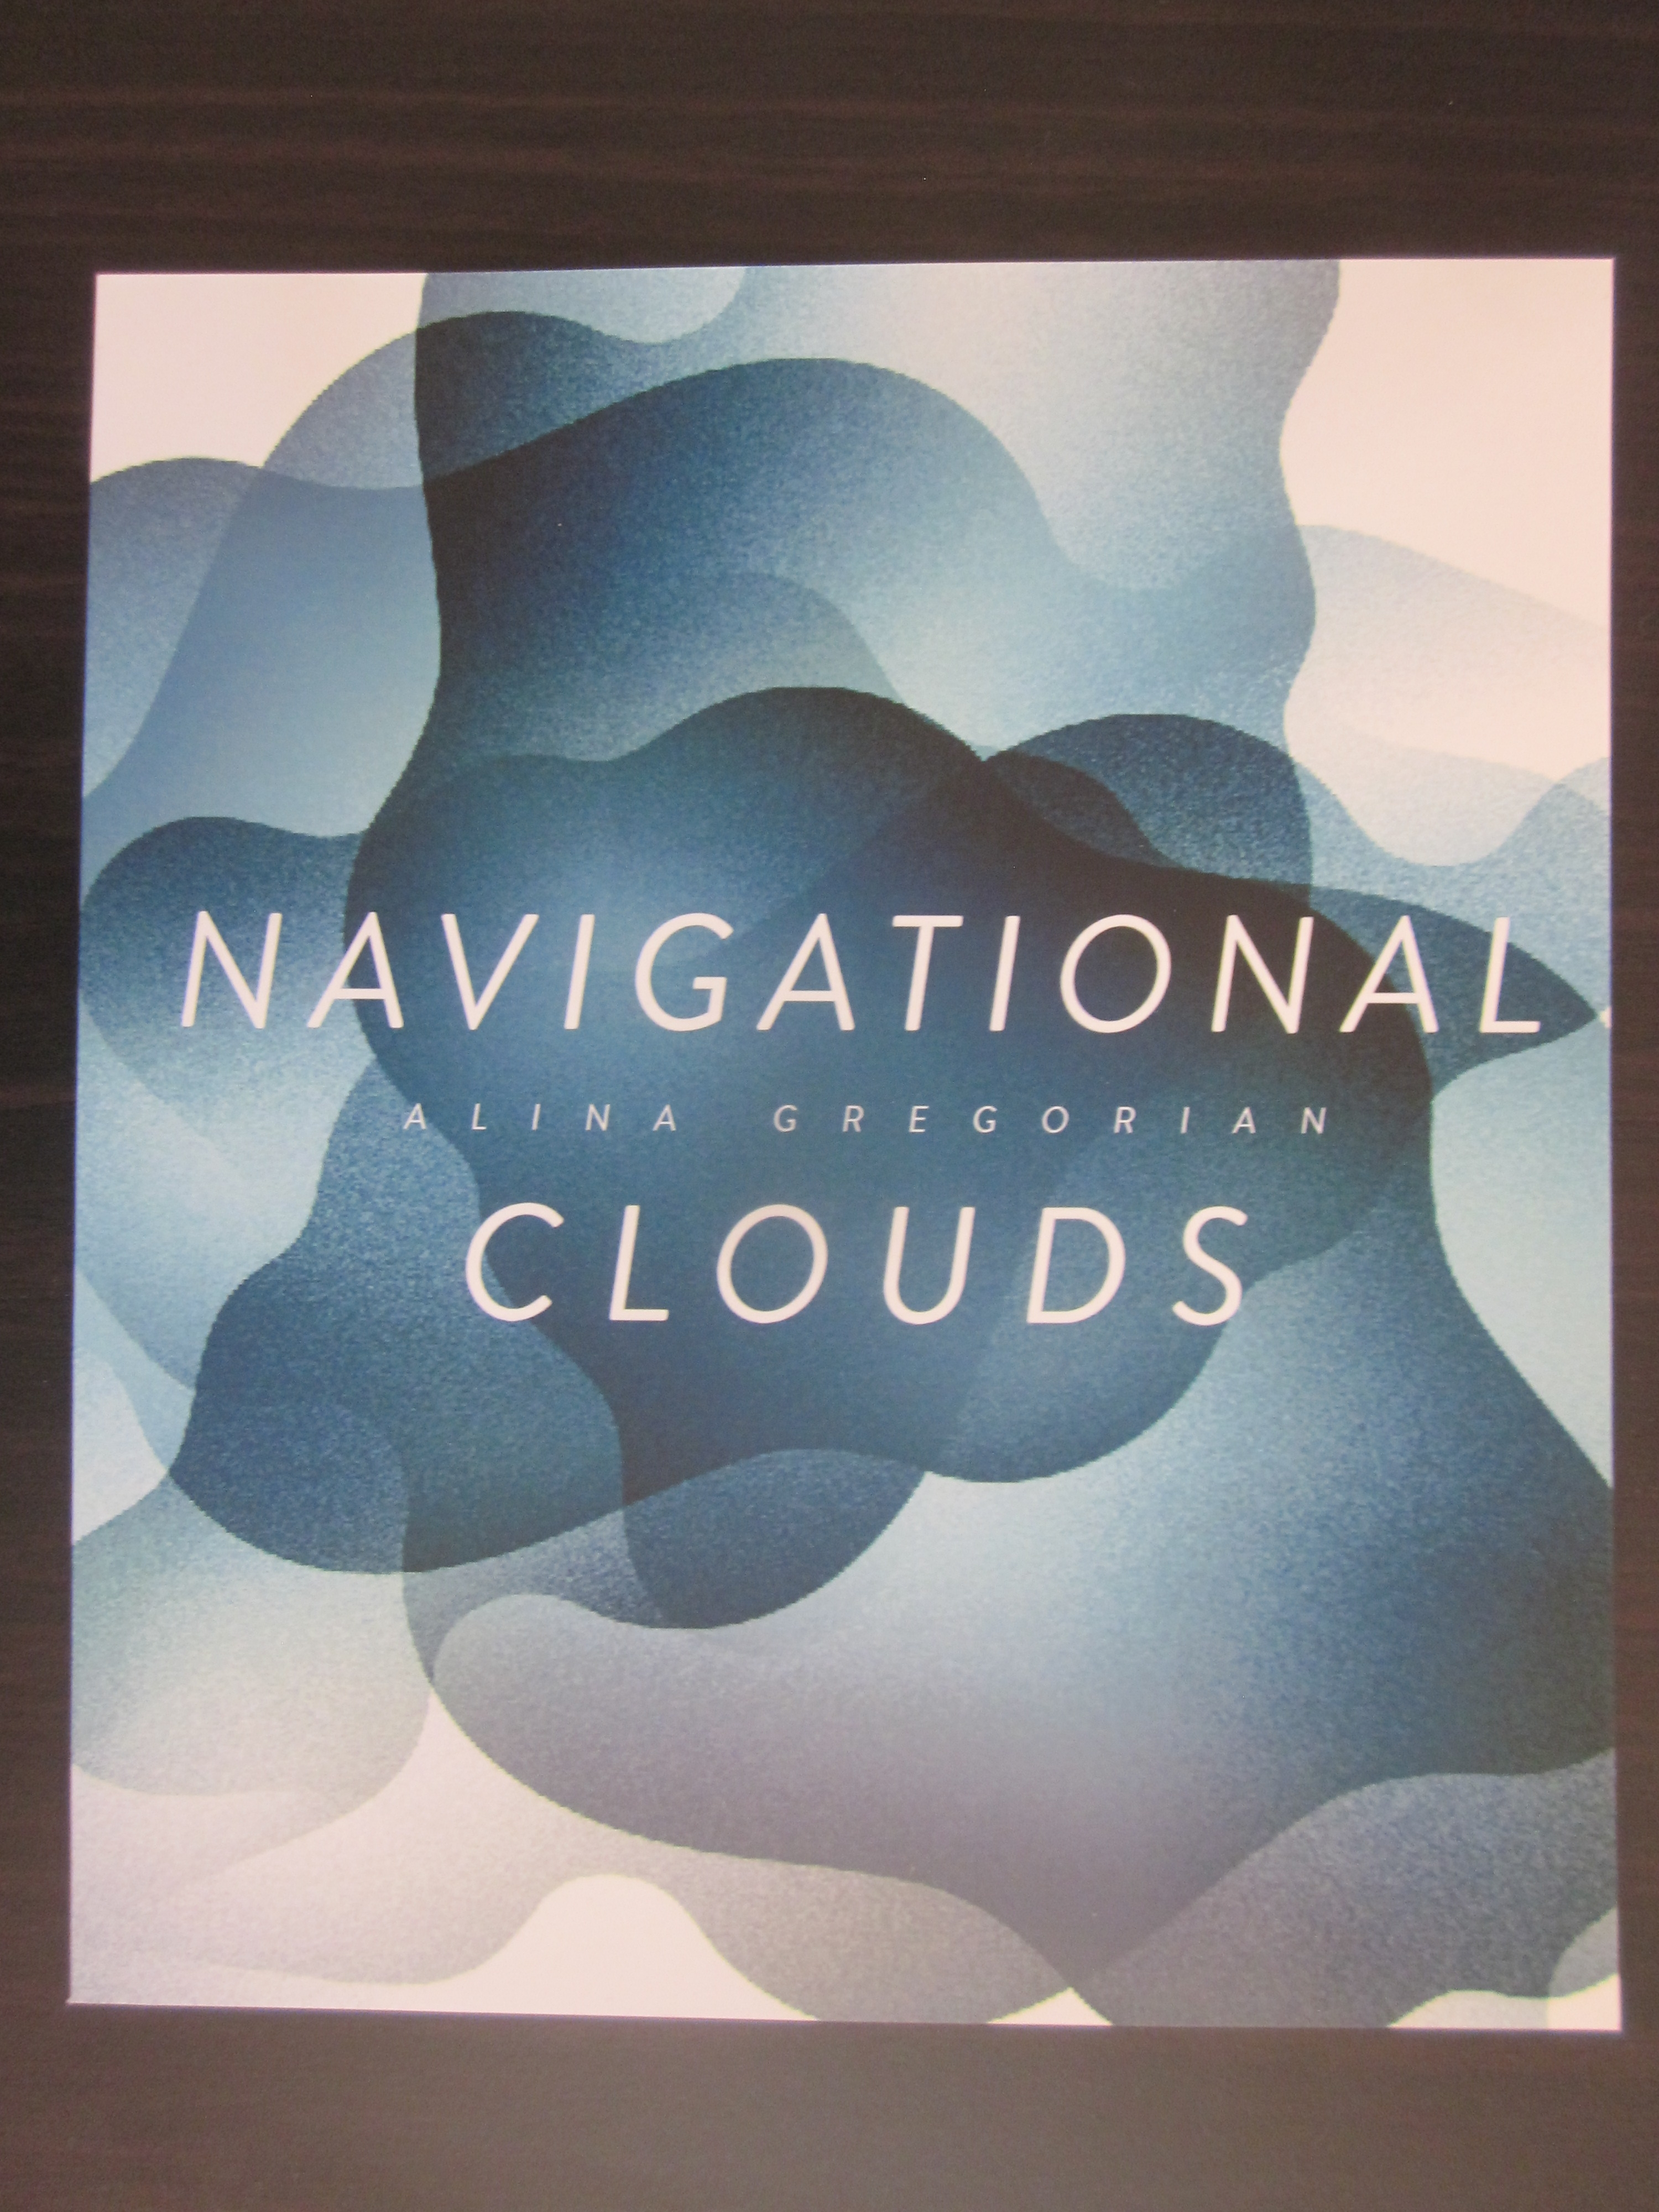 Navigational Clouds by Alina Gregorian